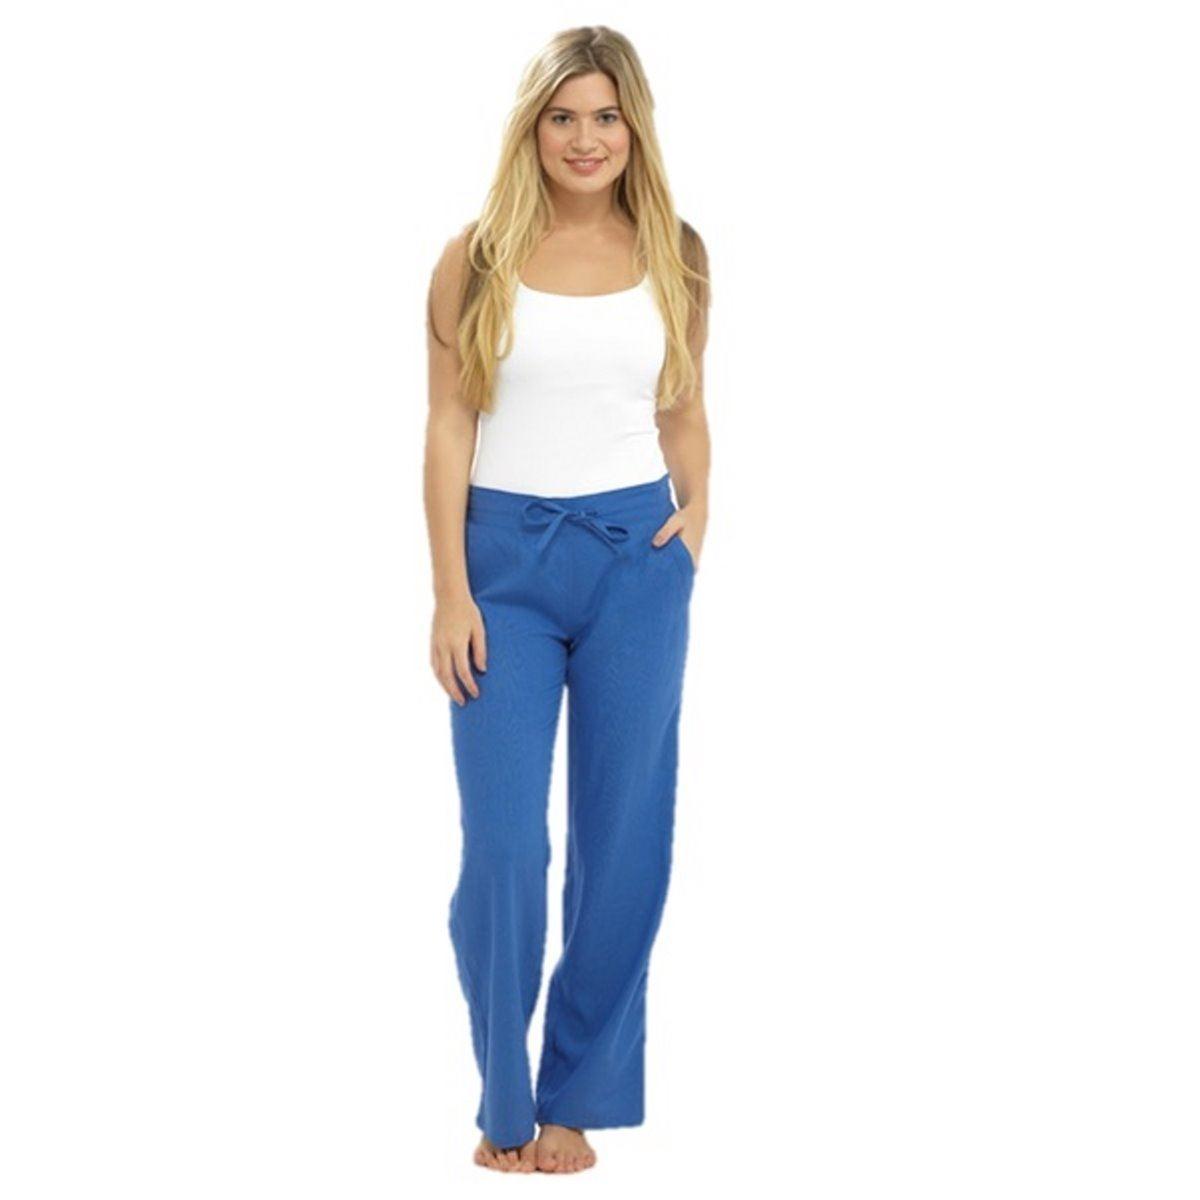 Fantastic Army Green Casual Linen Patchwork Pants Plus Size Women Crop Pants